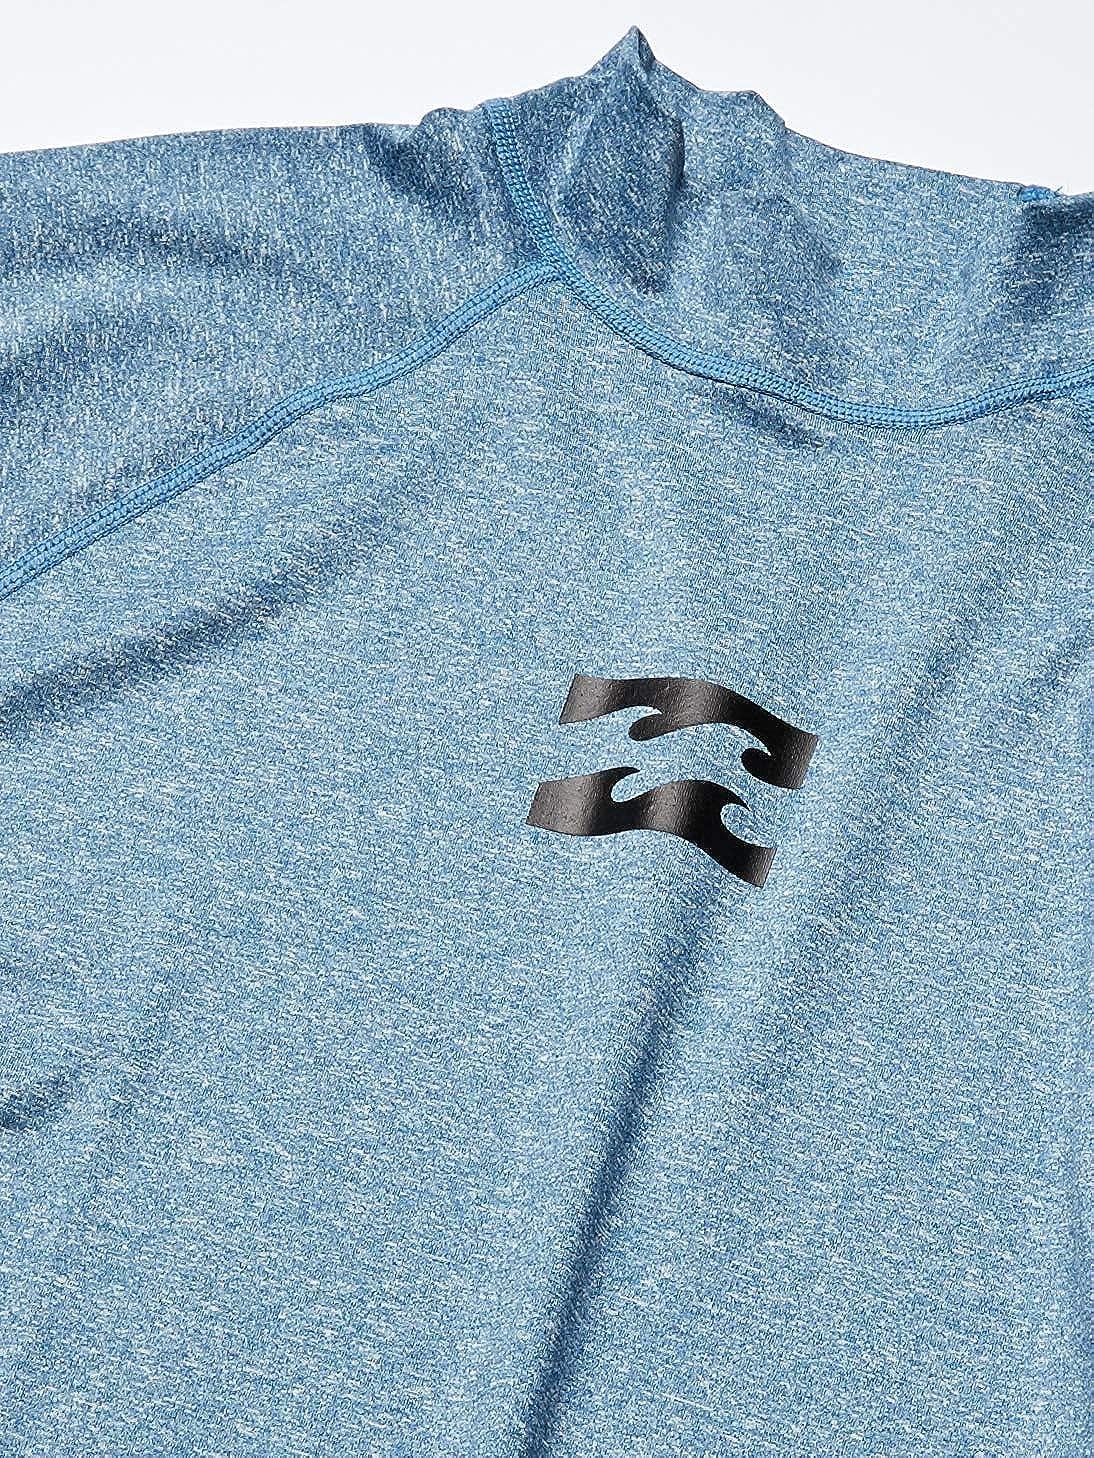 BILLABONG Mens All Day Wave Performance Fit Long Sleeve Rashguard Rash Guard Shirt